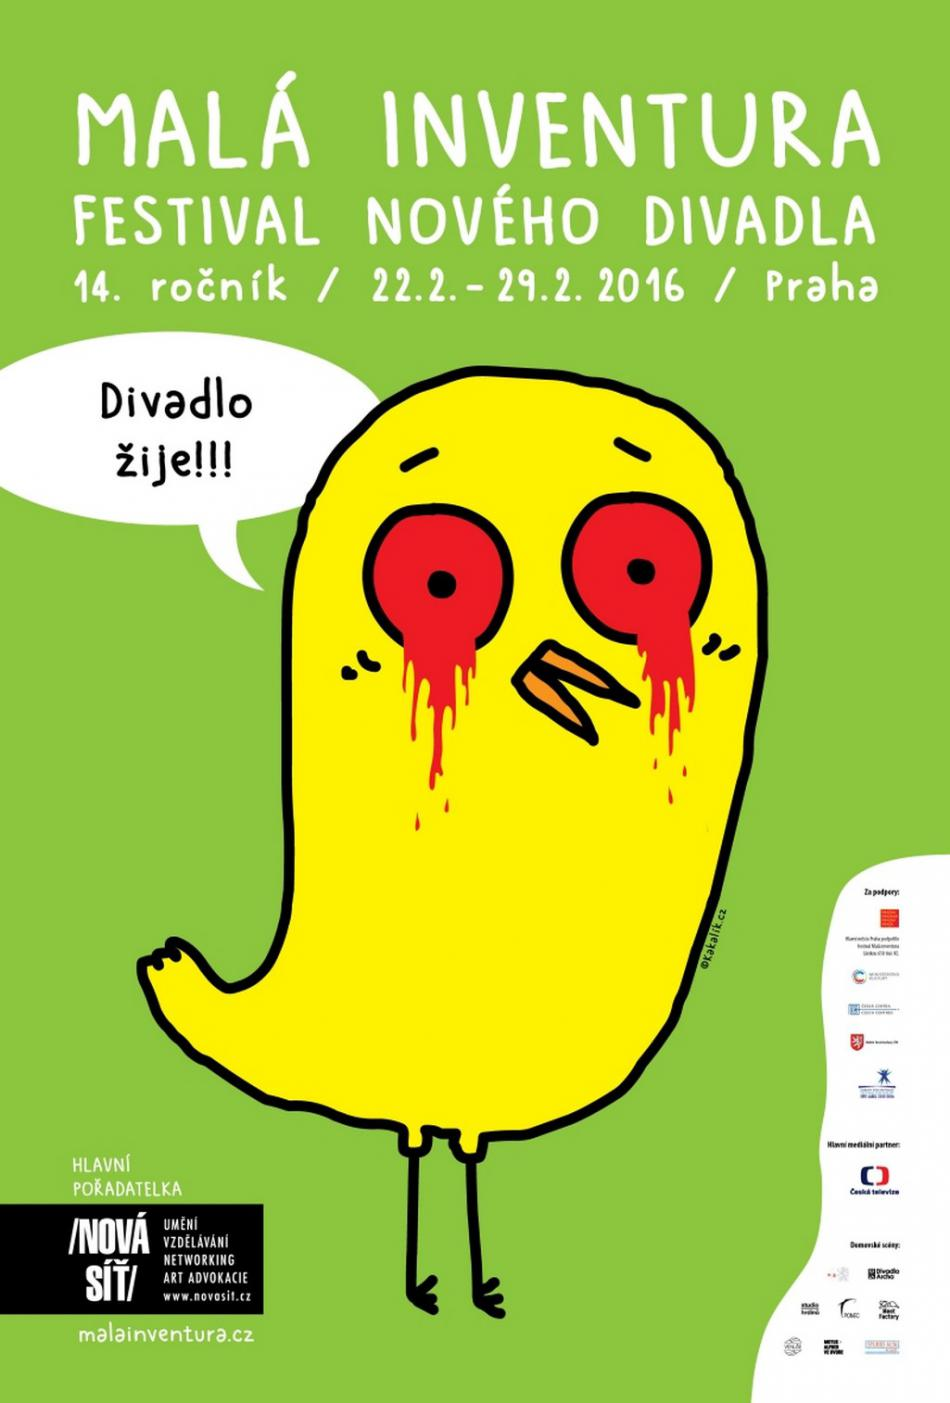 Plakát festivalu Malá inventura 2016